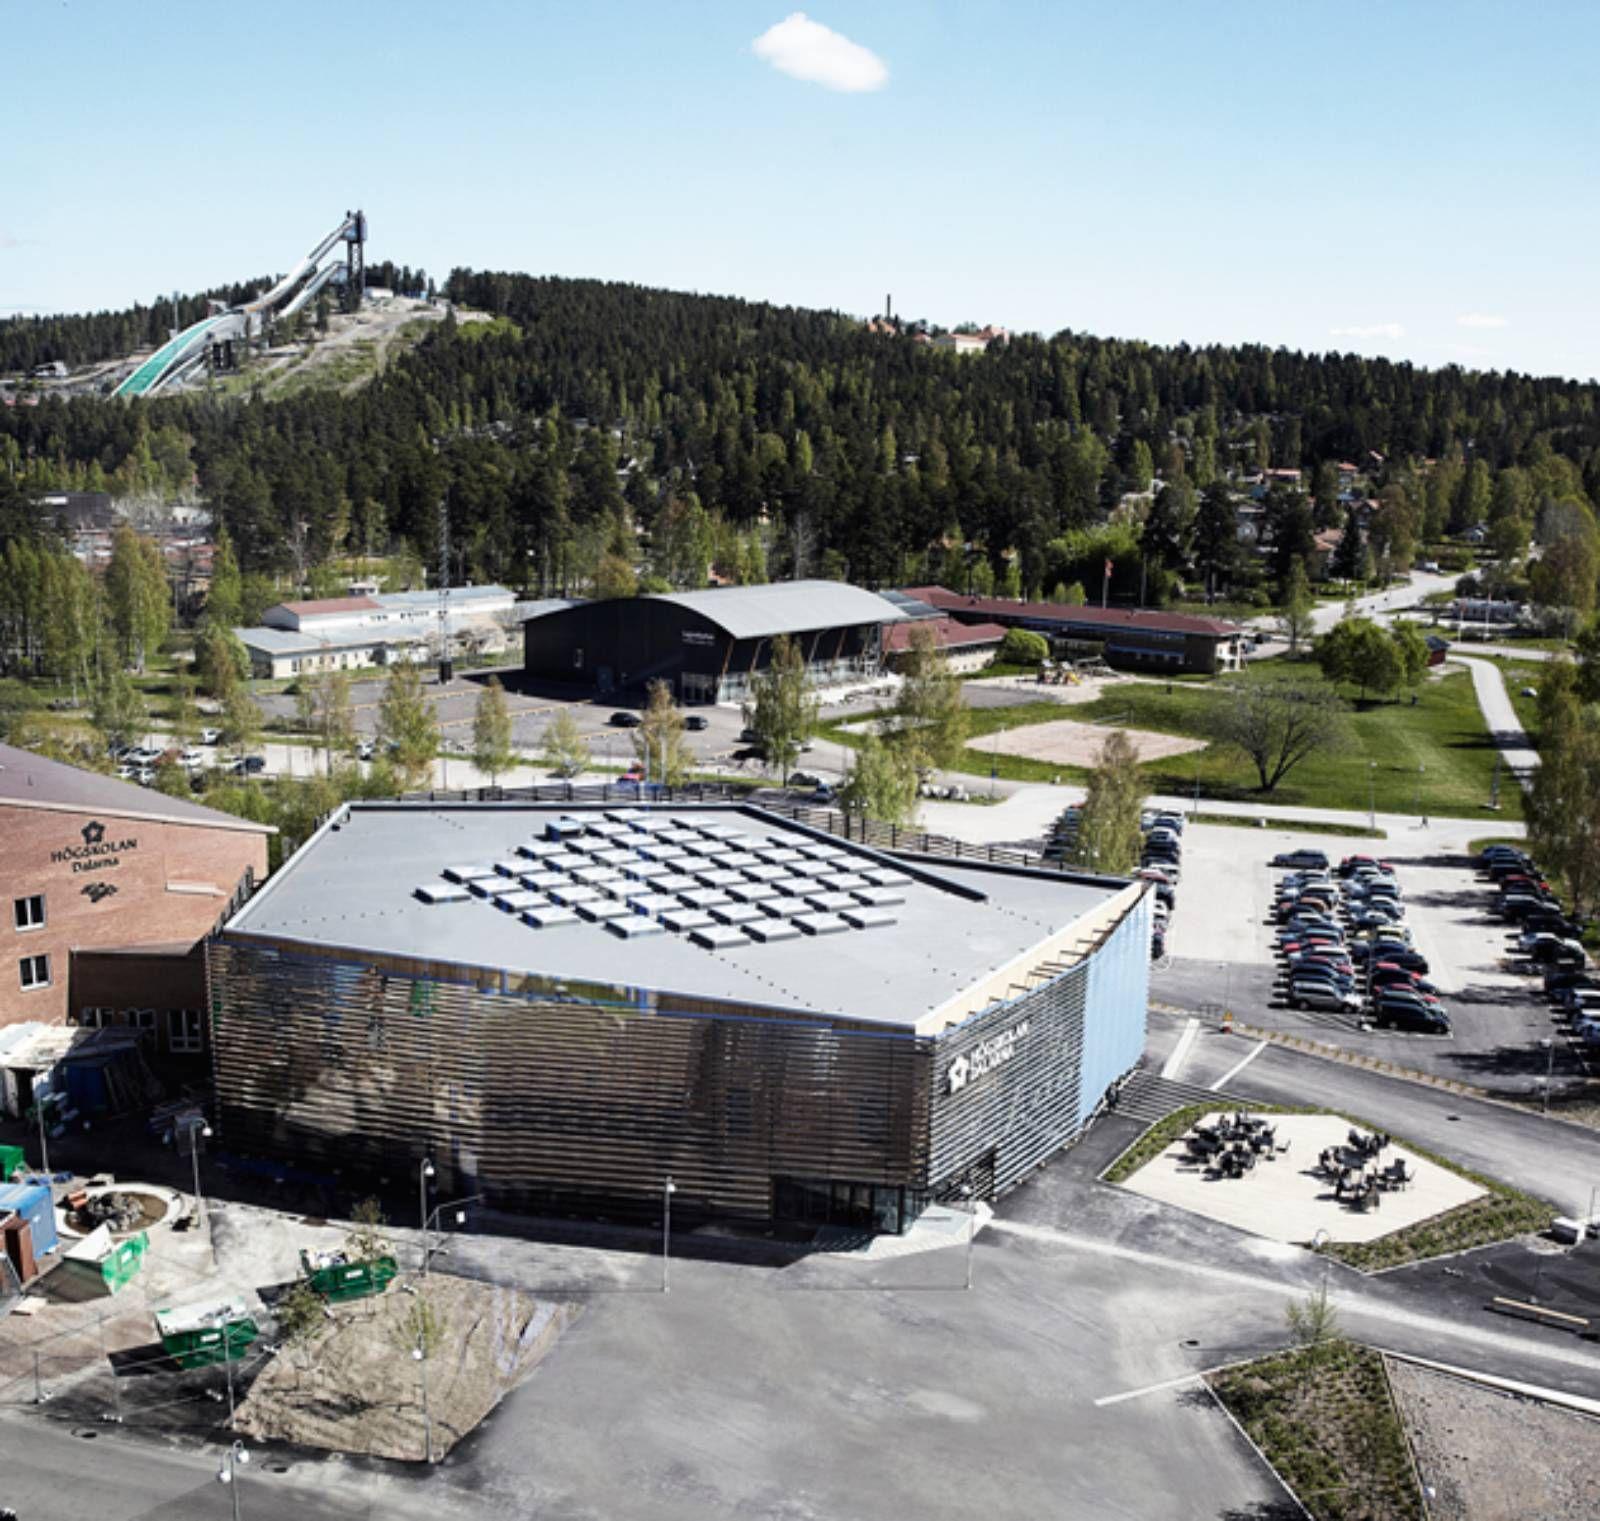 Dalarna Media Library, Falun, Sweden by ADEPT | LIBRARY